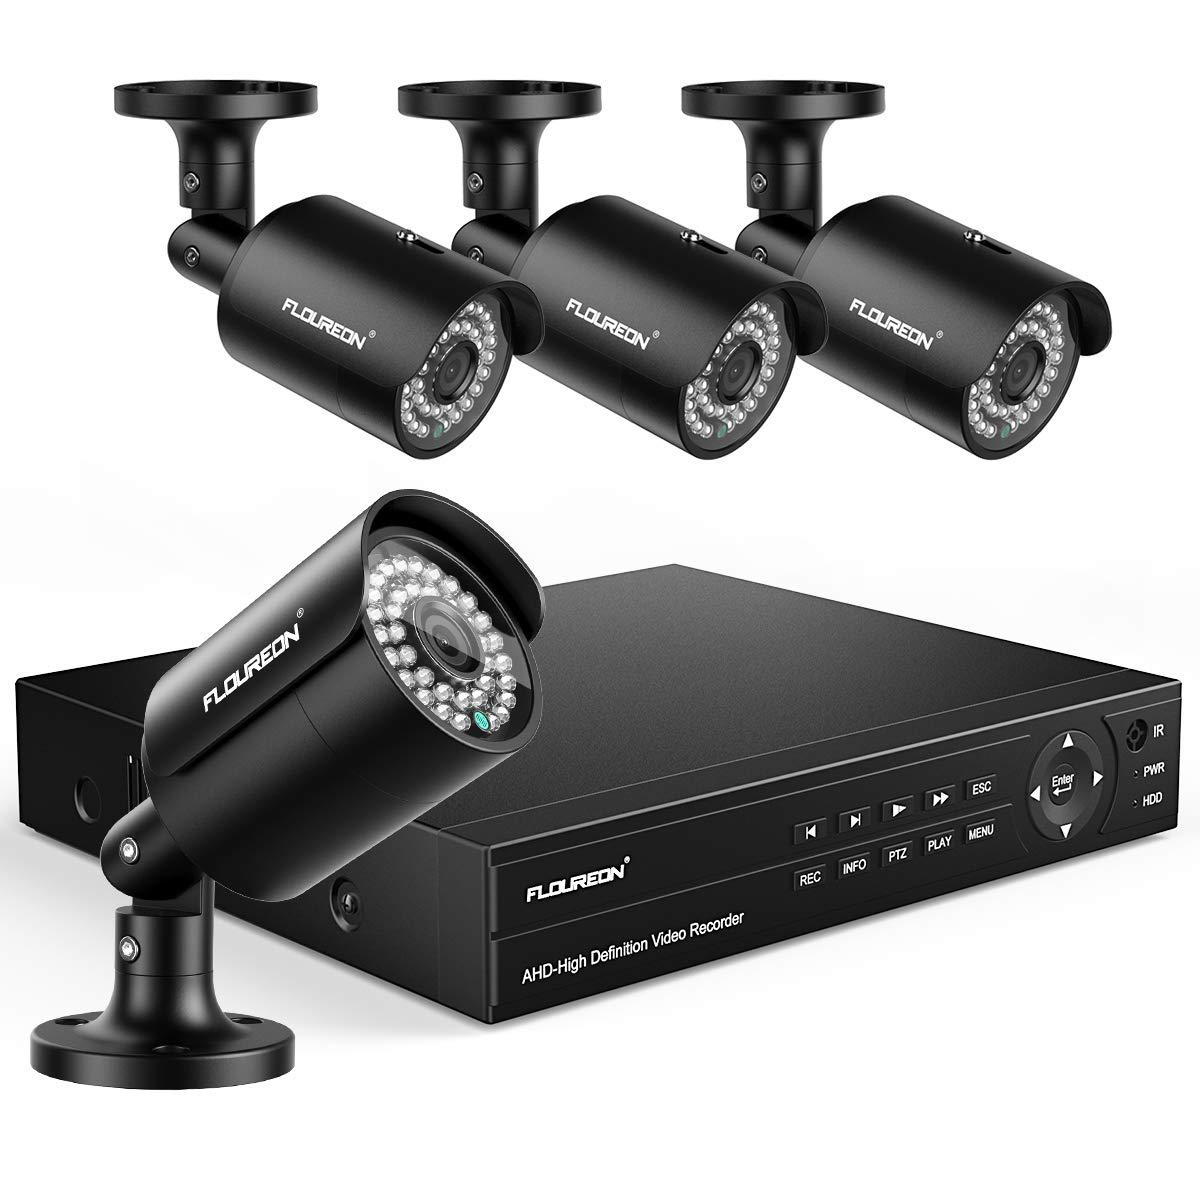 FLOUREON 8CH Security Camera System True HD 1080P 6-in-1 Video DVR Recorder with 4X HD 1080P XVI Indoor Outdoor Weatherproof CCTV Cameras by floureon